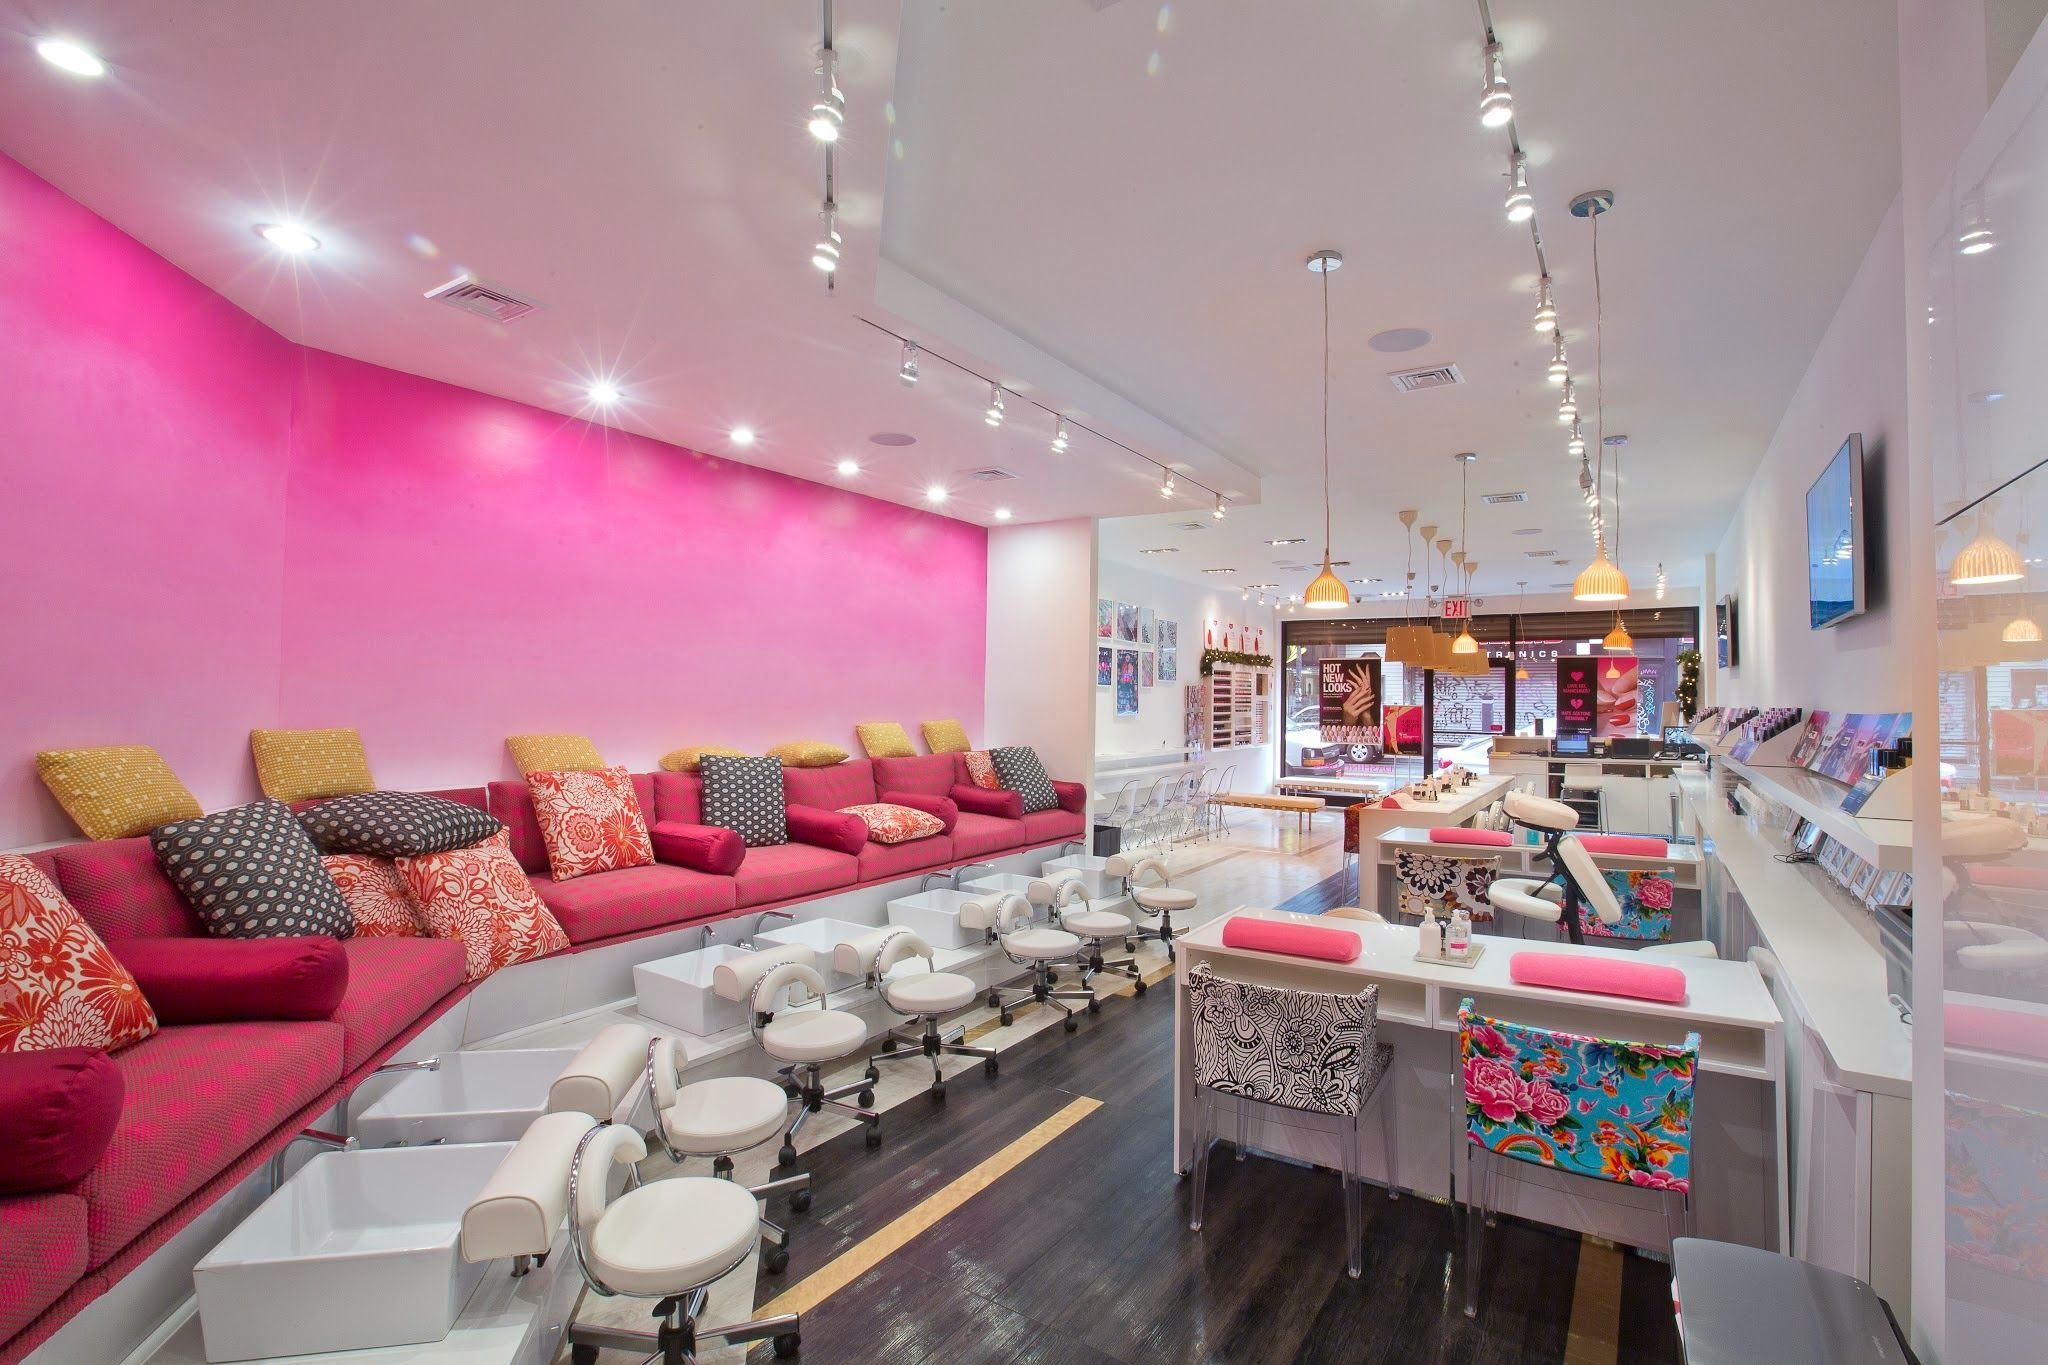 Google+ | Nail salon | Pinterest | Salons, Salon ideas and Salon design